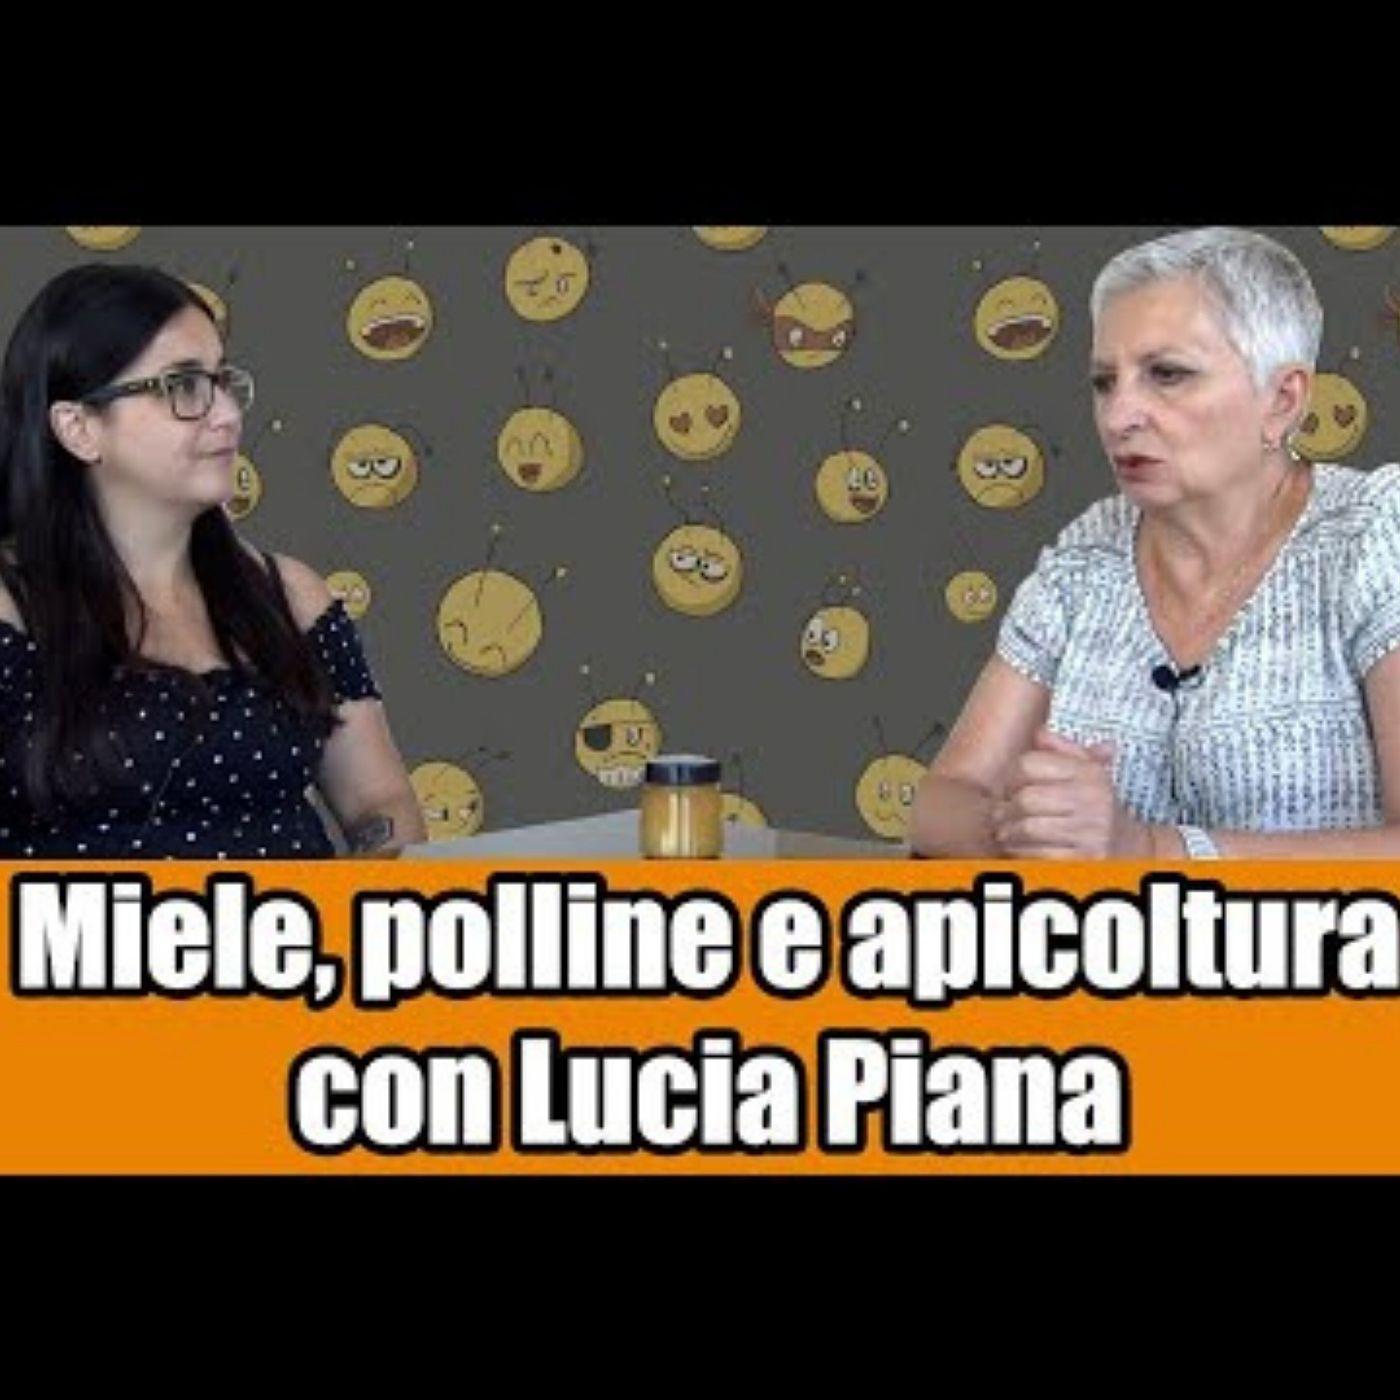 Inter-BEE-sta a Lucia Piana: miele, polline e apicoltura